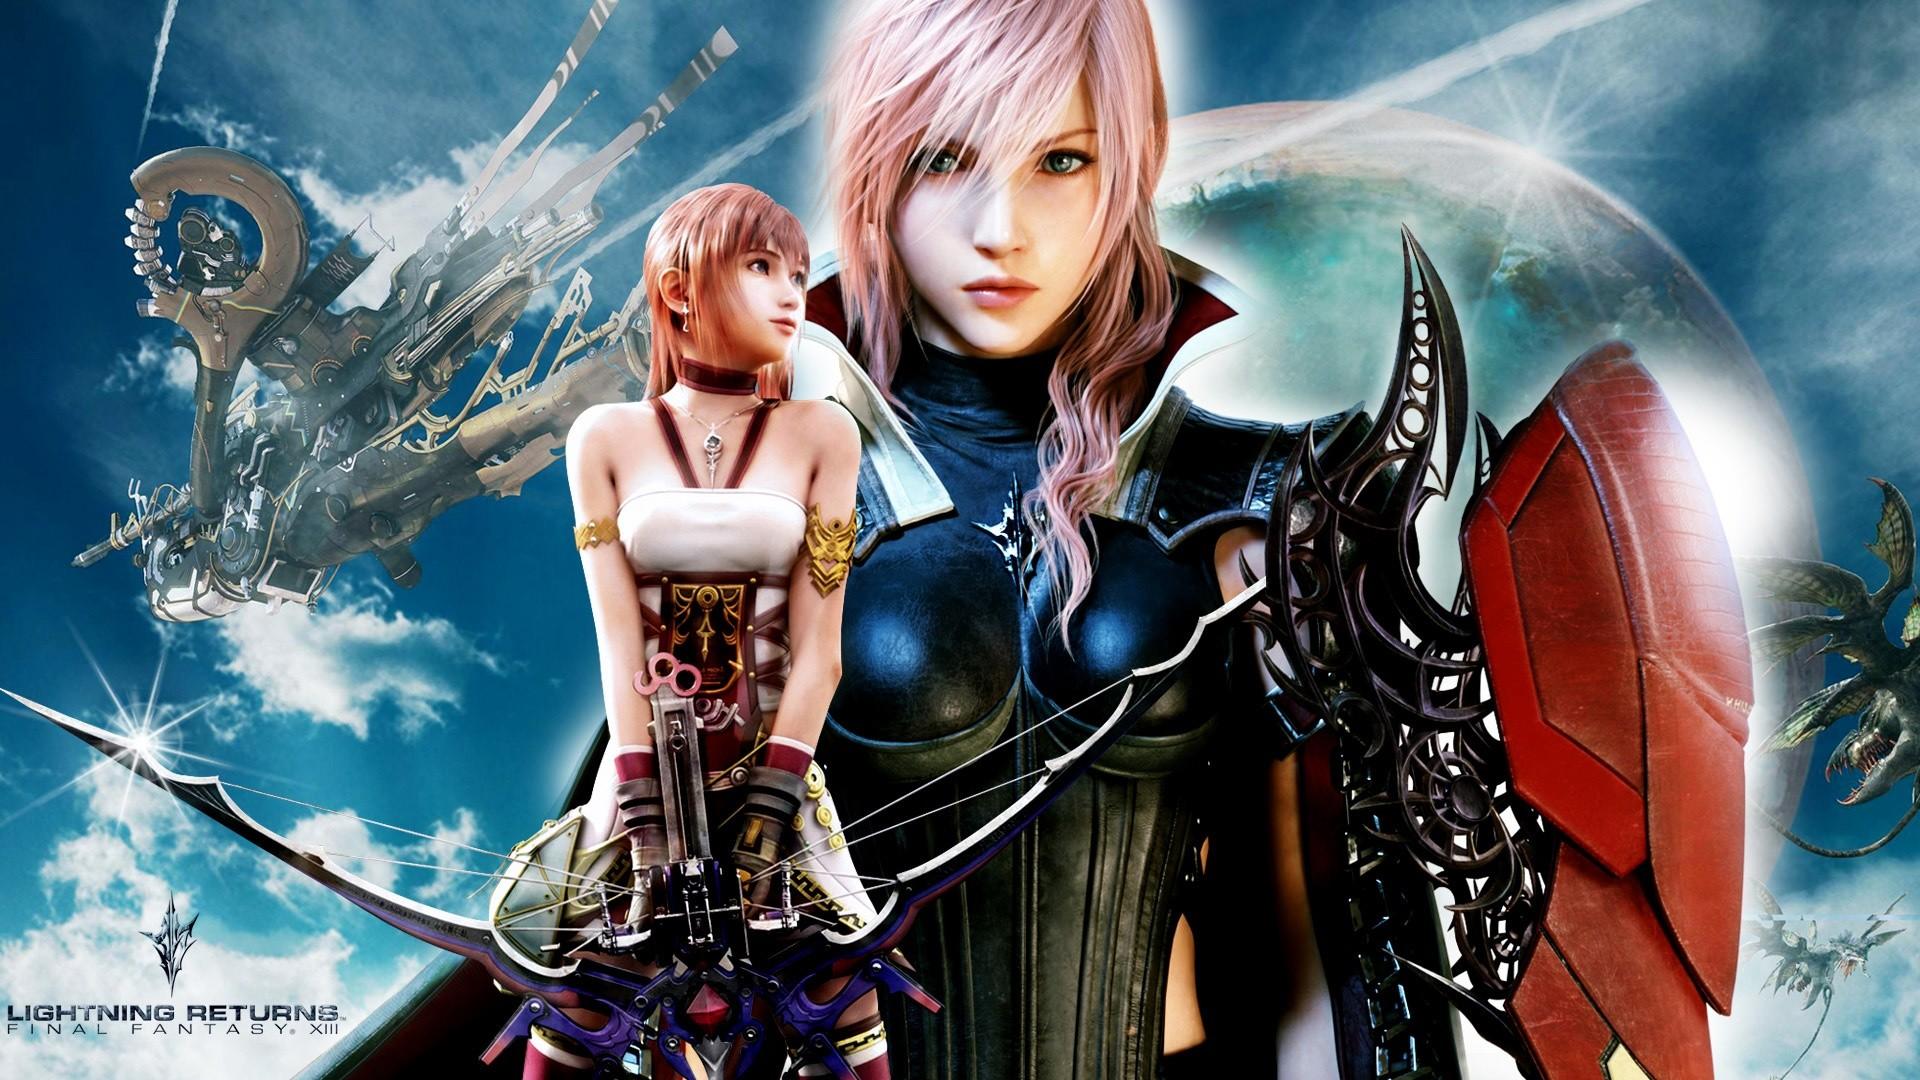 Lightning Returns Final Fantasy XIII Wallpapers | HD Wallpapers